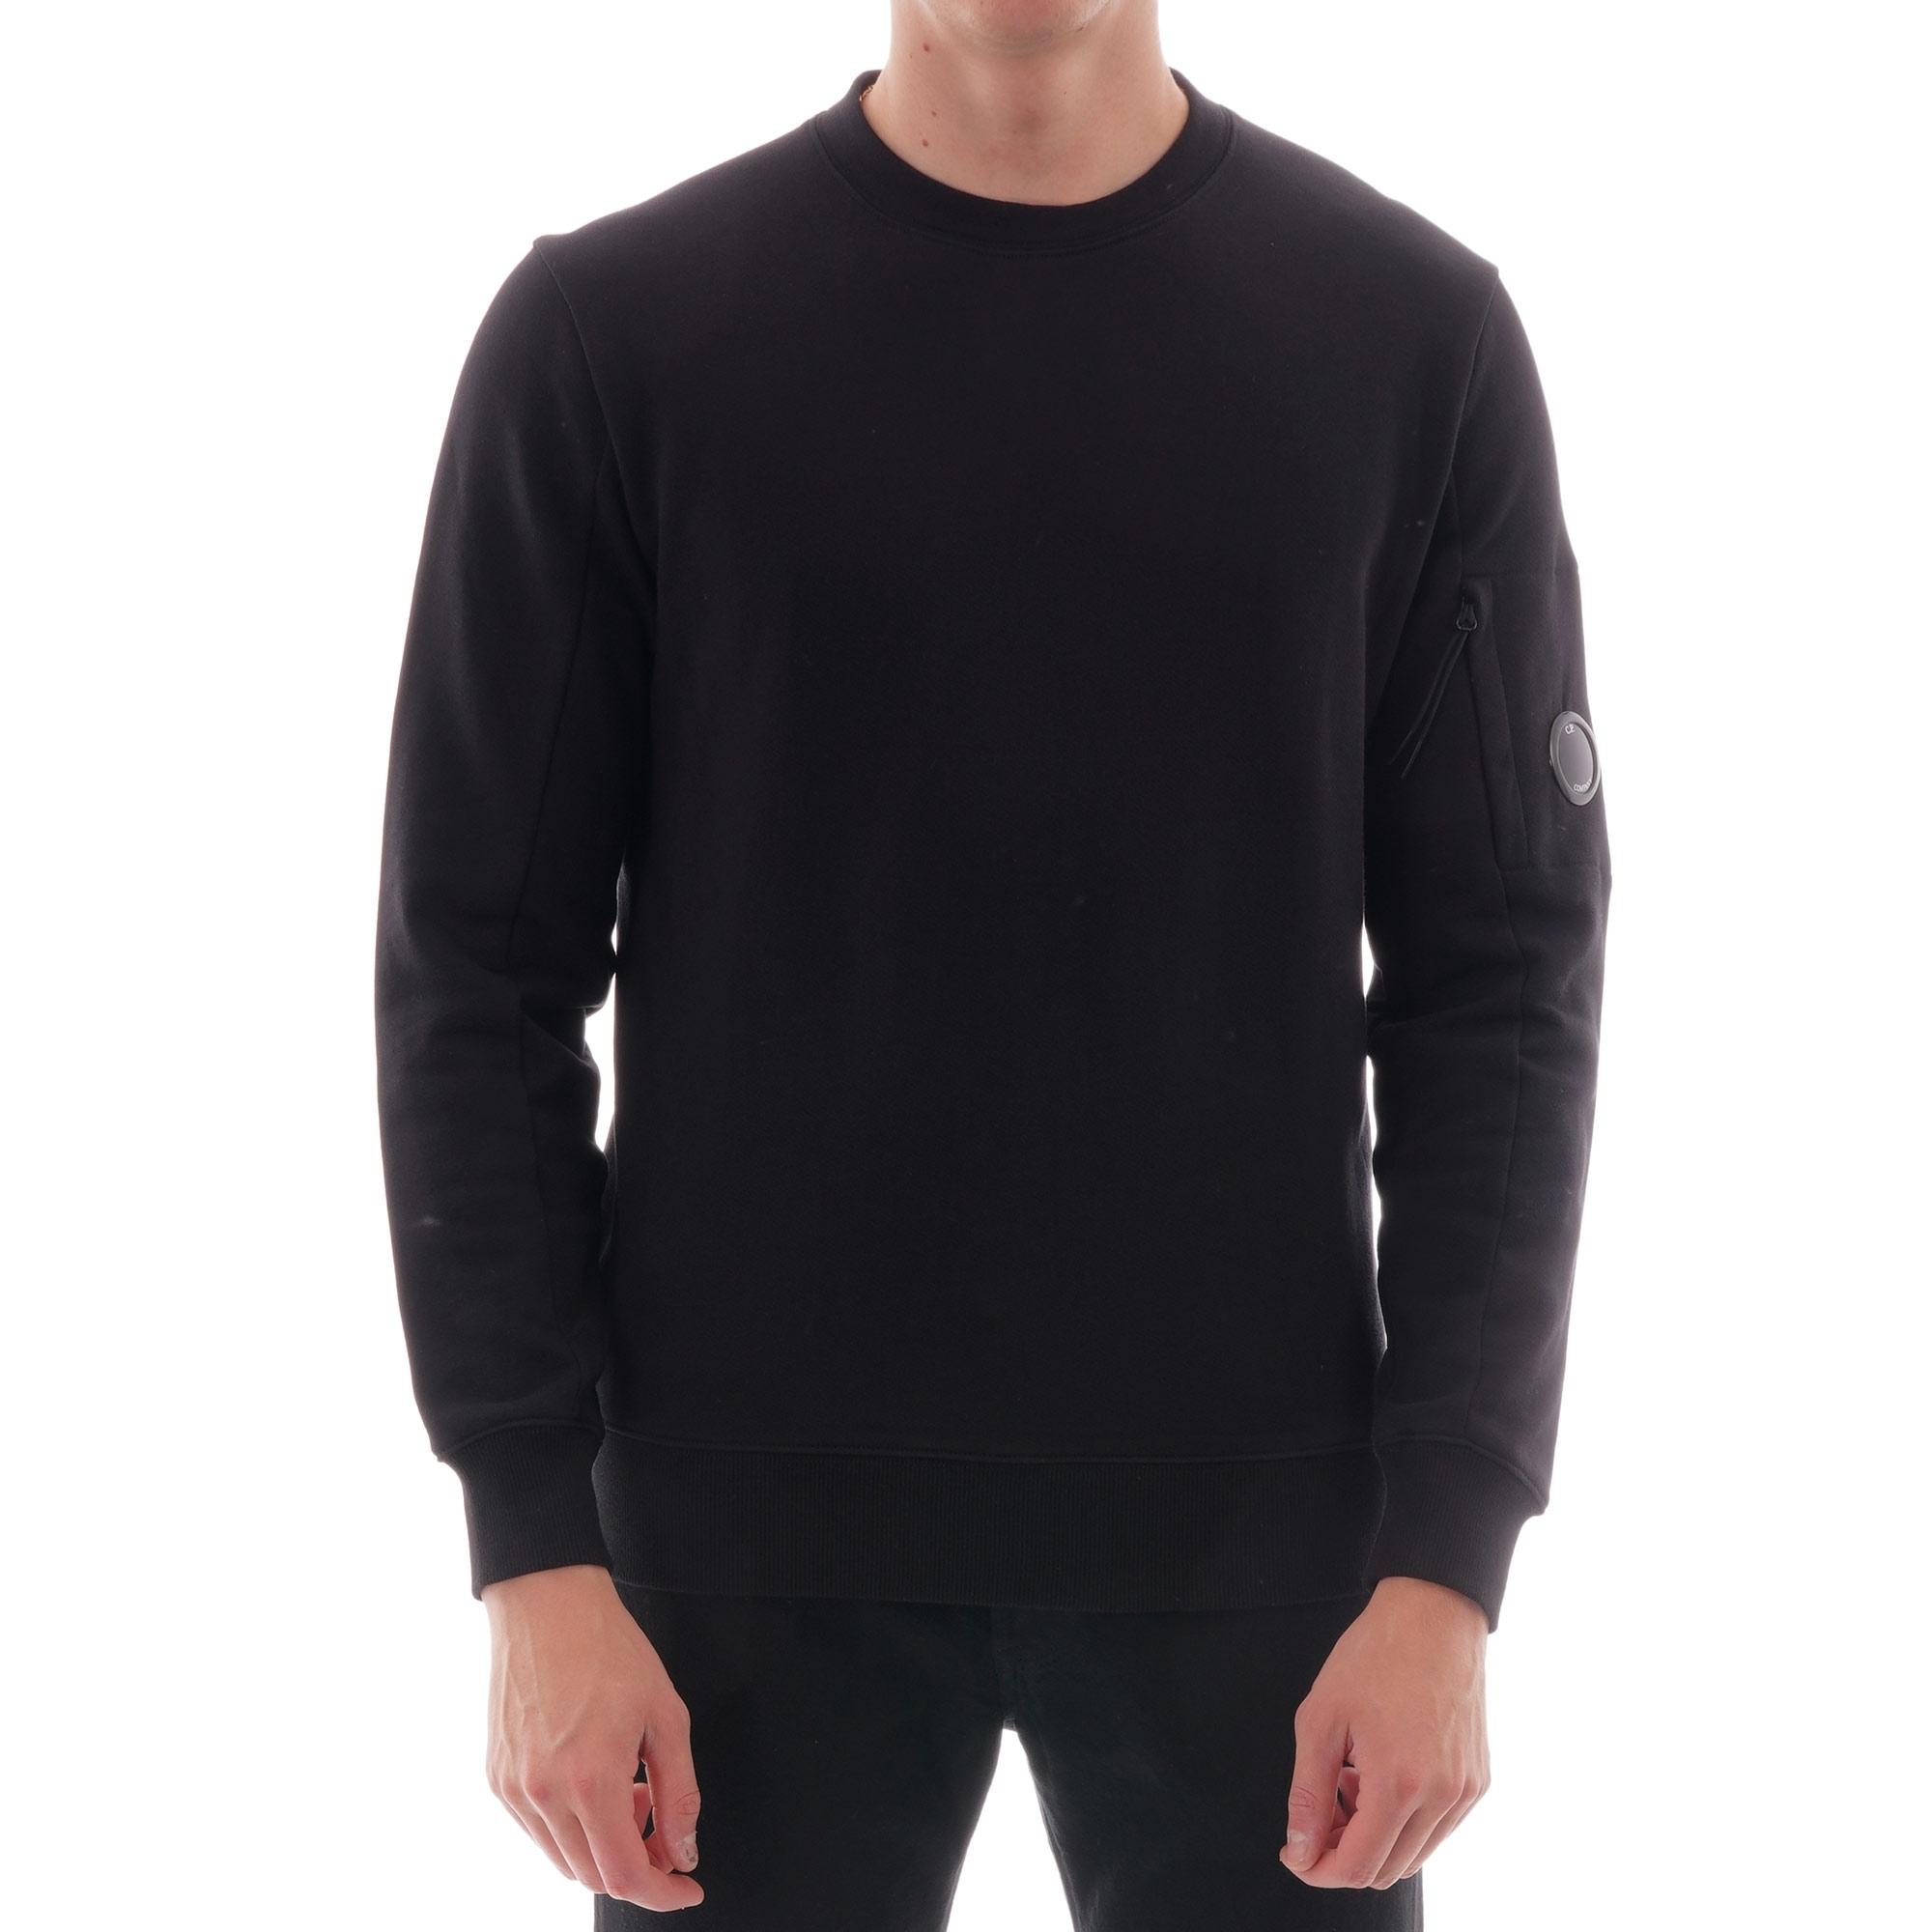 Image of Garment Dyed Light Fleece Lens Crew Sweatshirt - Black